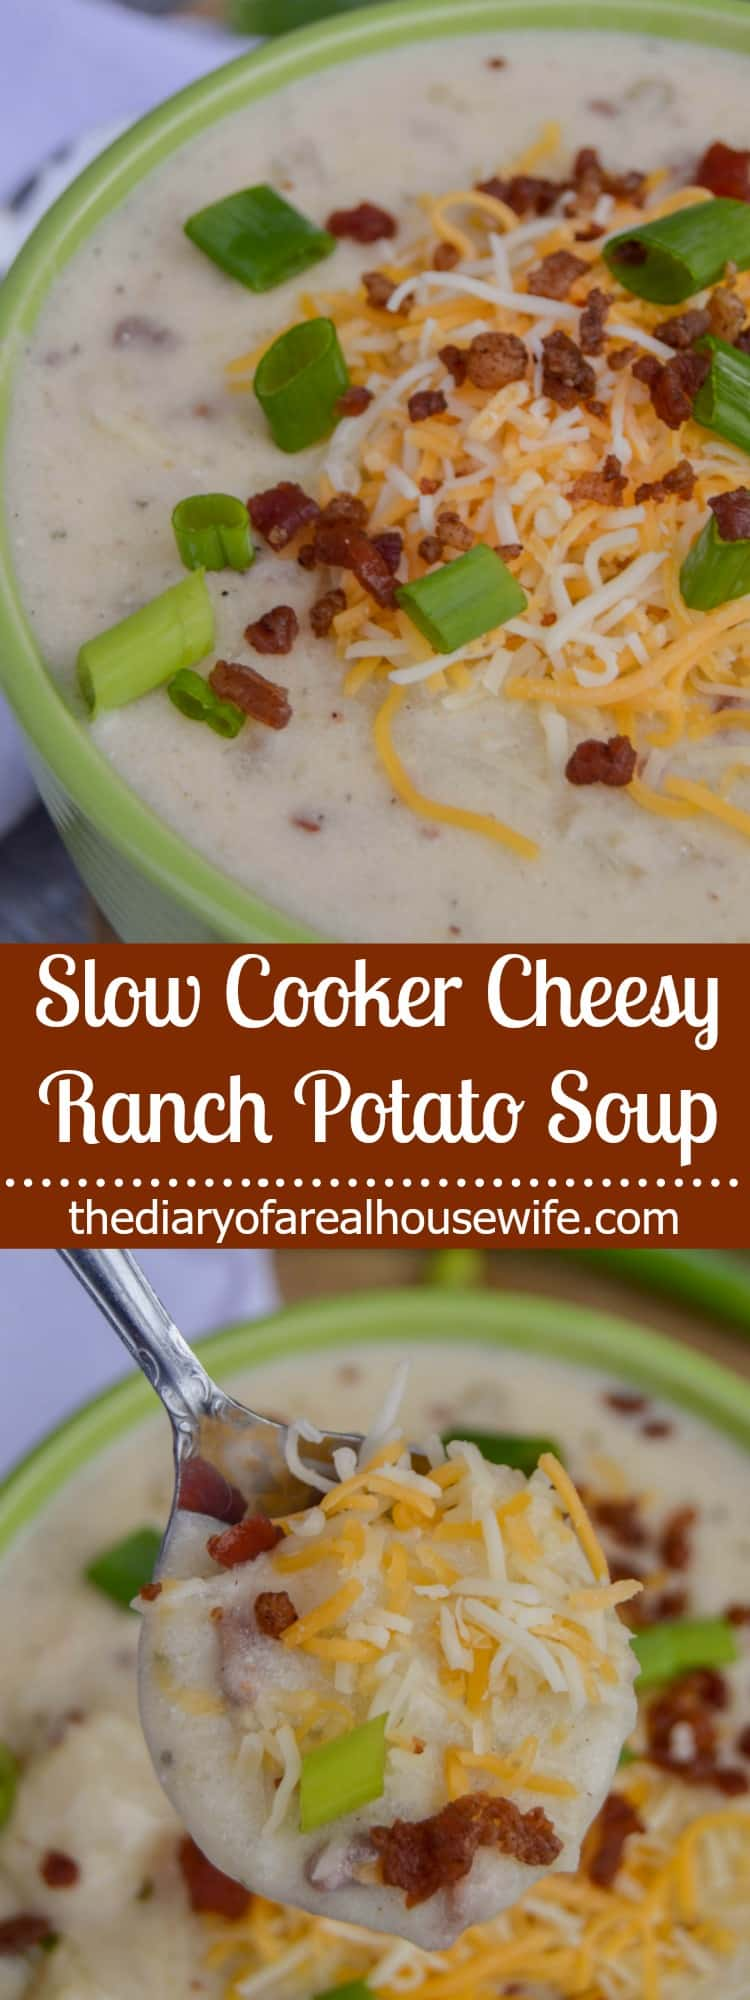 Slow Cooker Cheesy Ranch Potato Soup